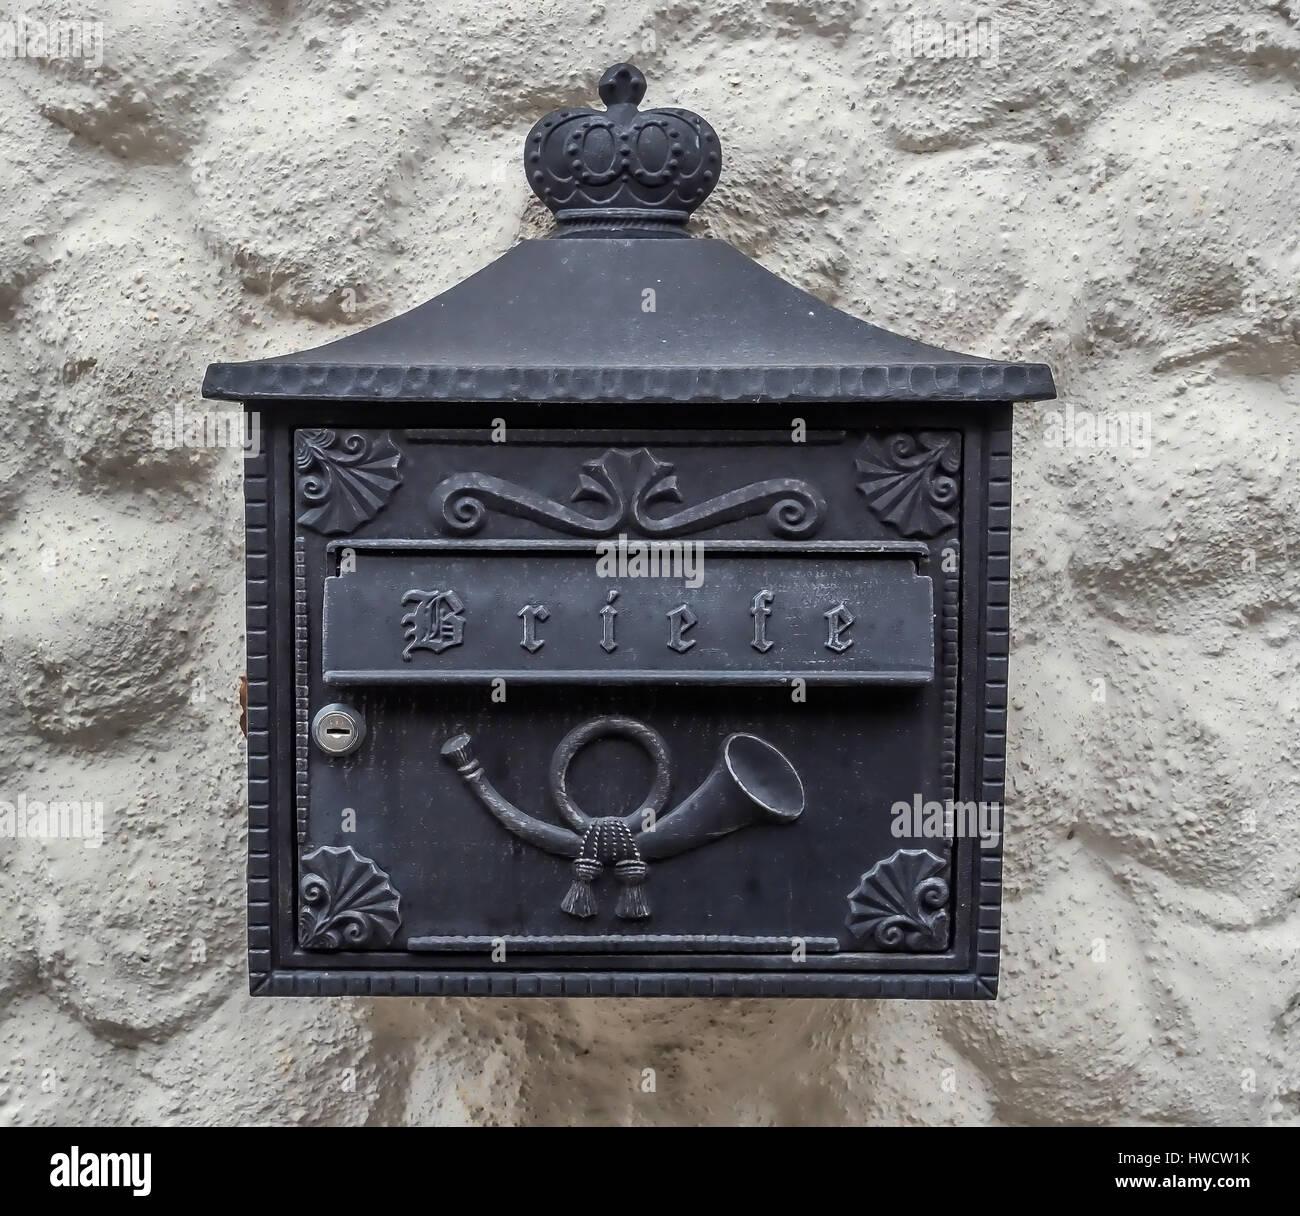 A letter-box in a Huasmauer waits for incoming letters, Ein Postkasten an einer Huasmauer wartet auf ankommende Stock Photo